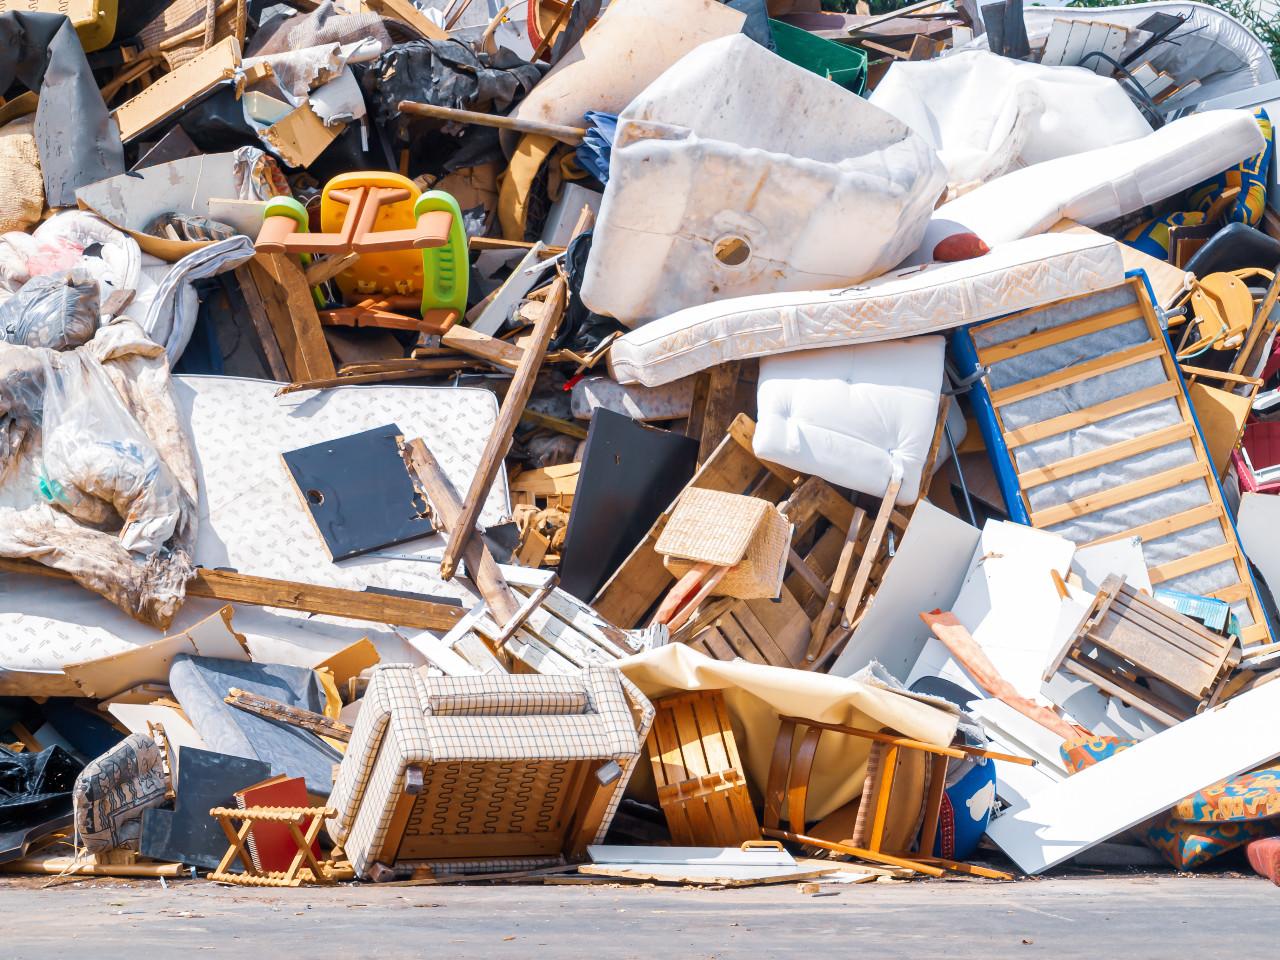 Furniture sent to landfill